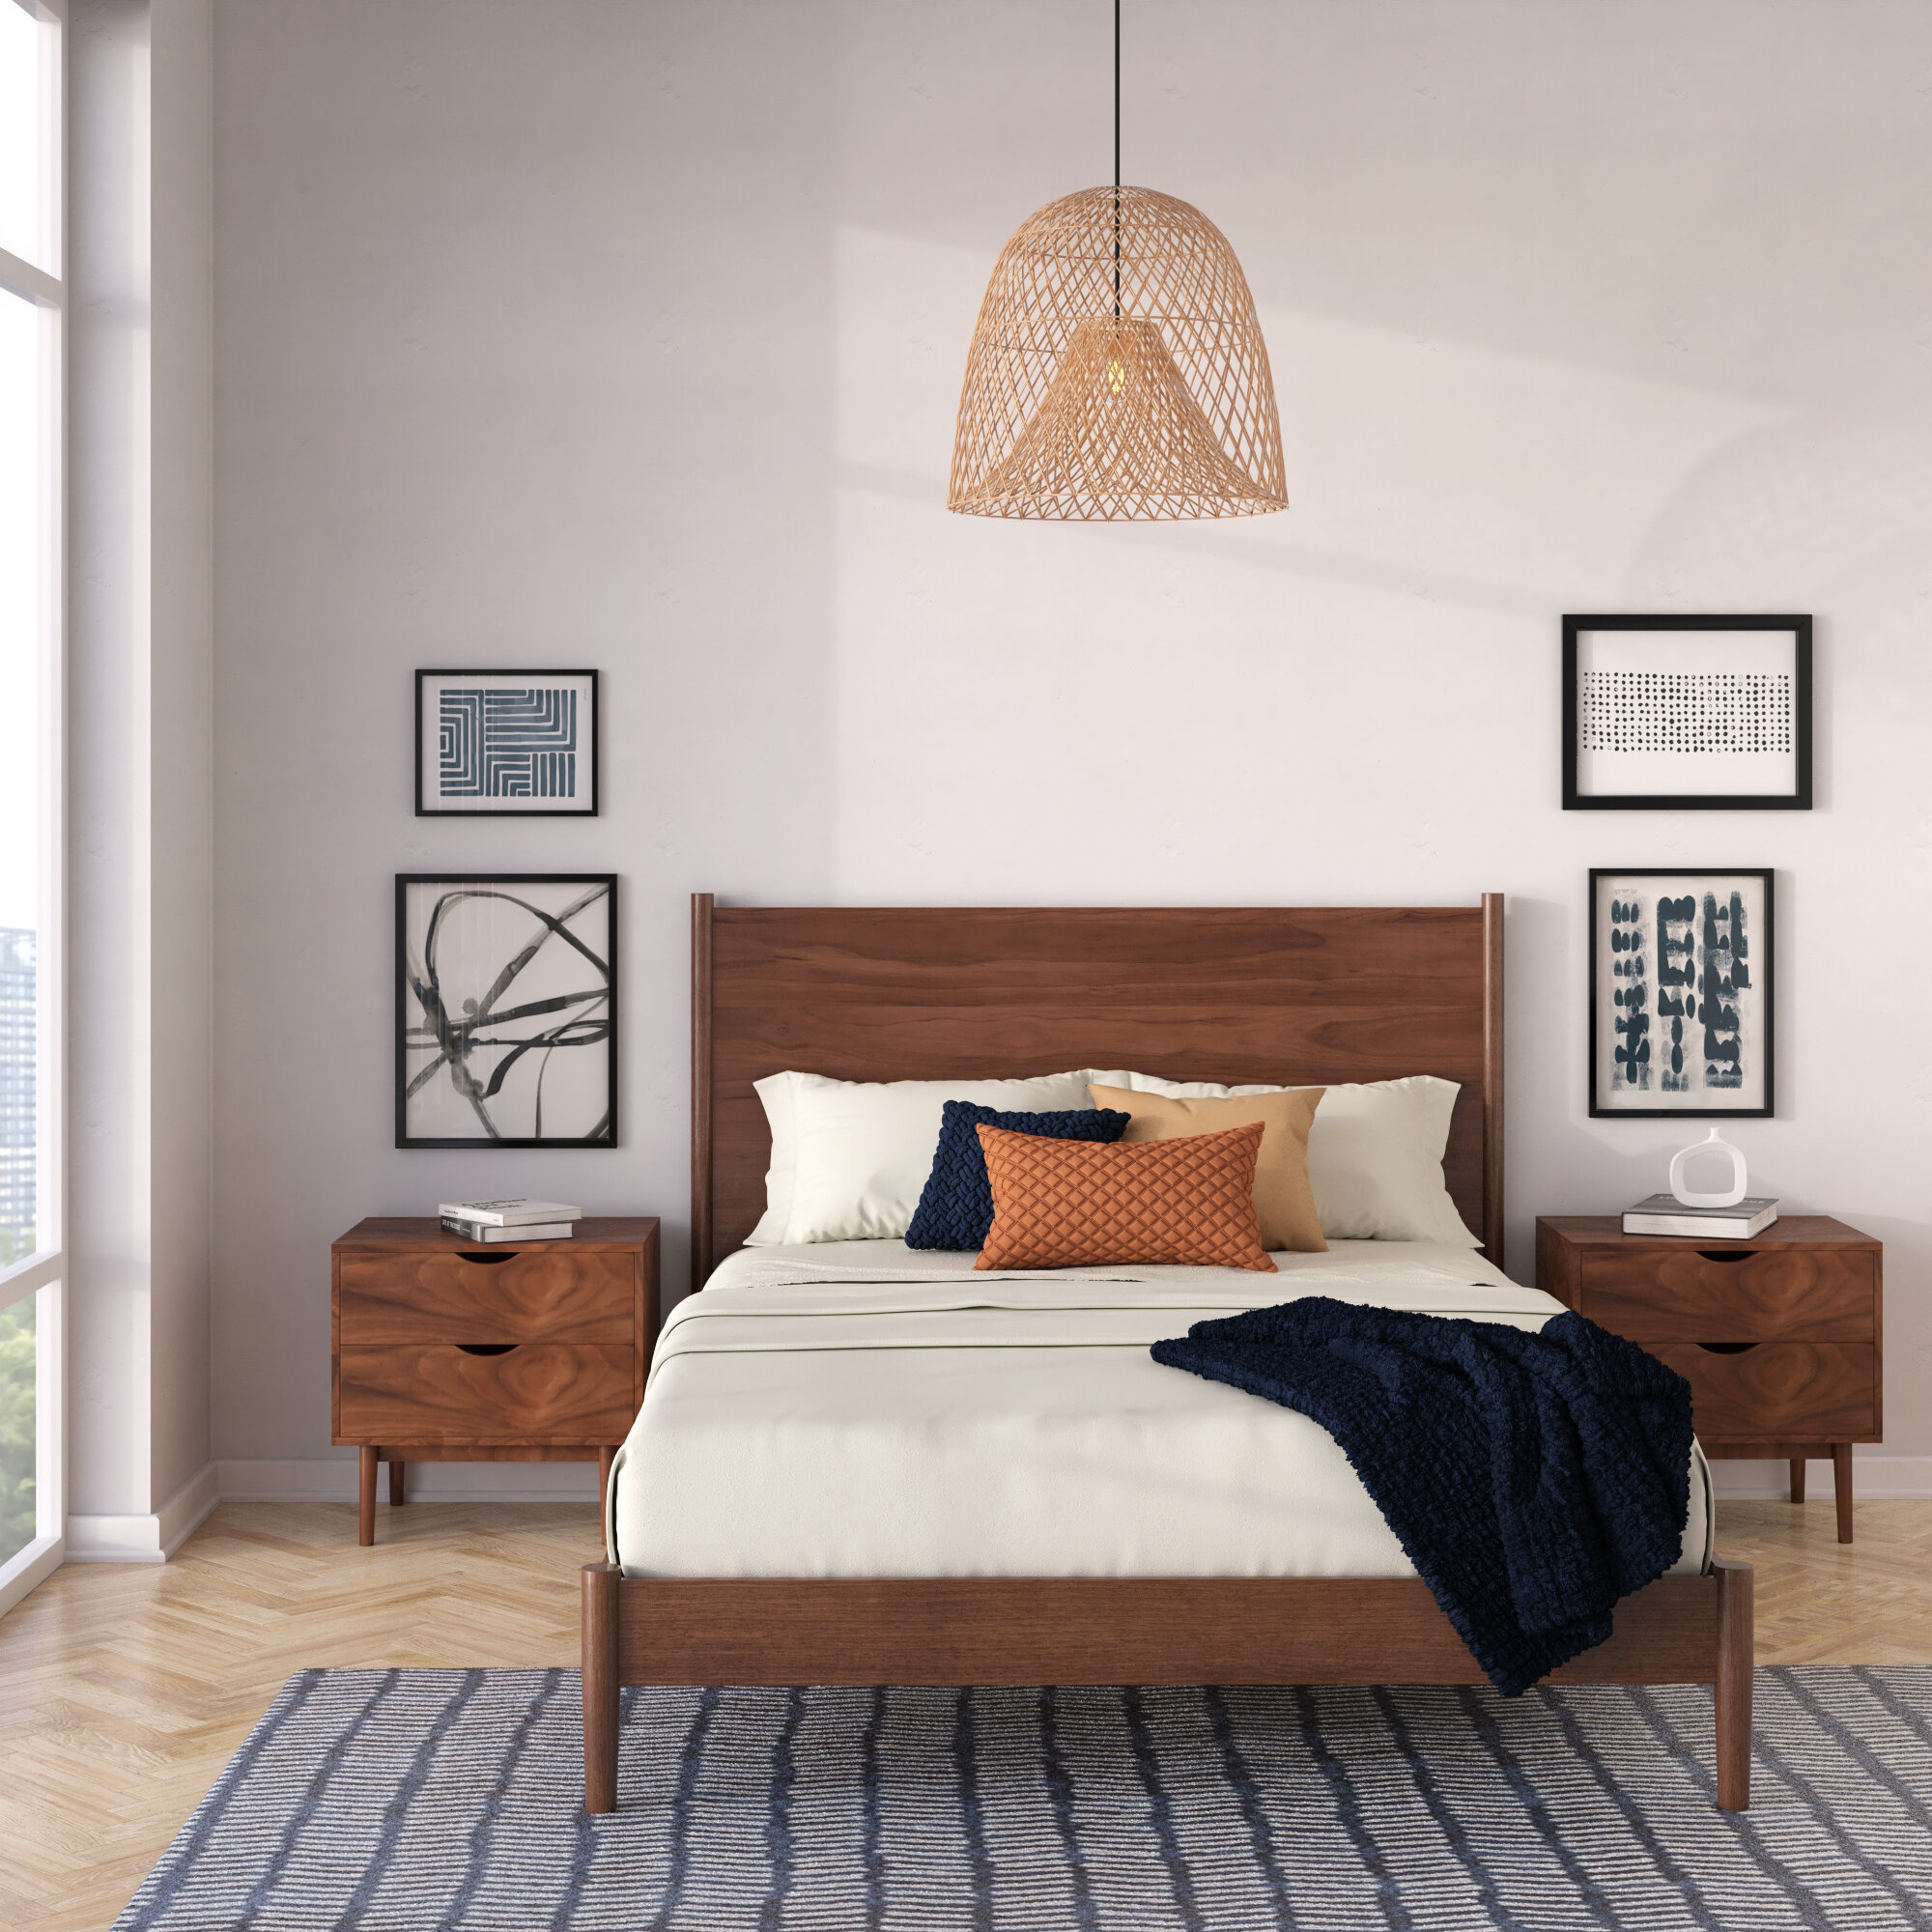 Mid Century Modern Bedroom Sets You Ll Love In 2020 Wayfair